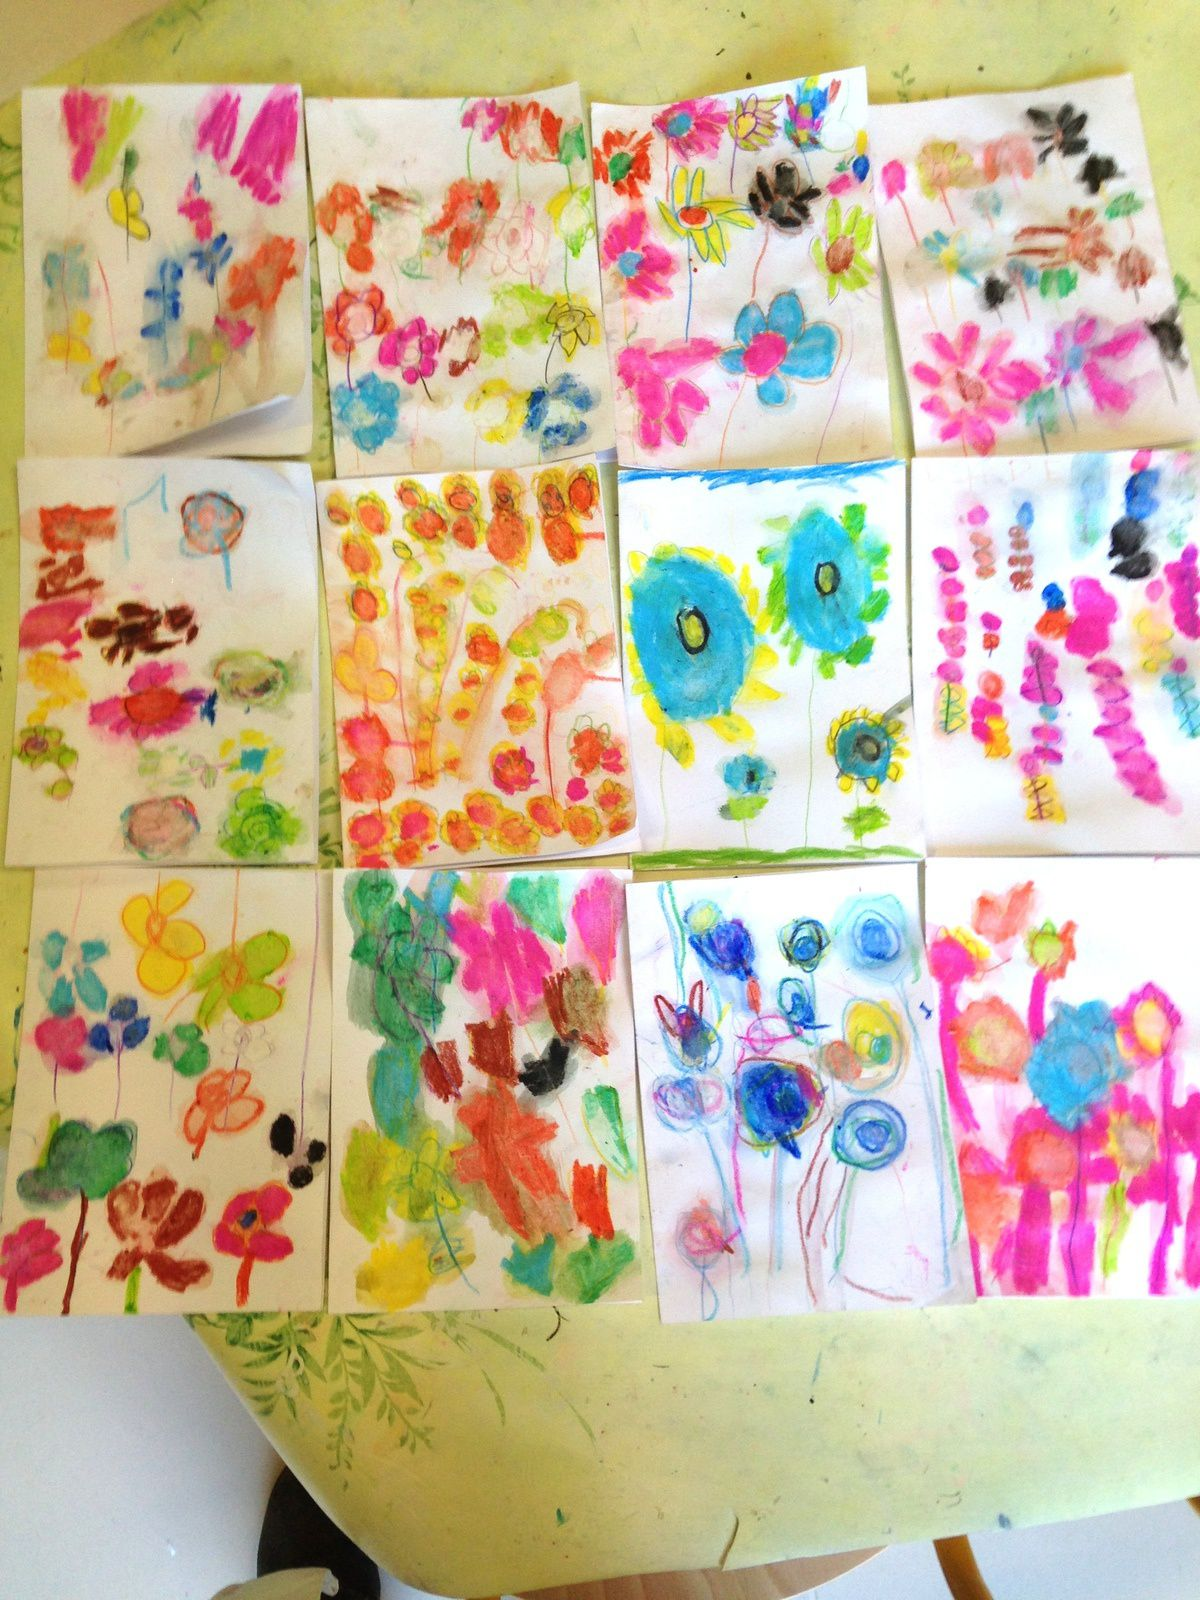 #diy #enfant #fleur #art #charlotteblablablog